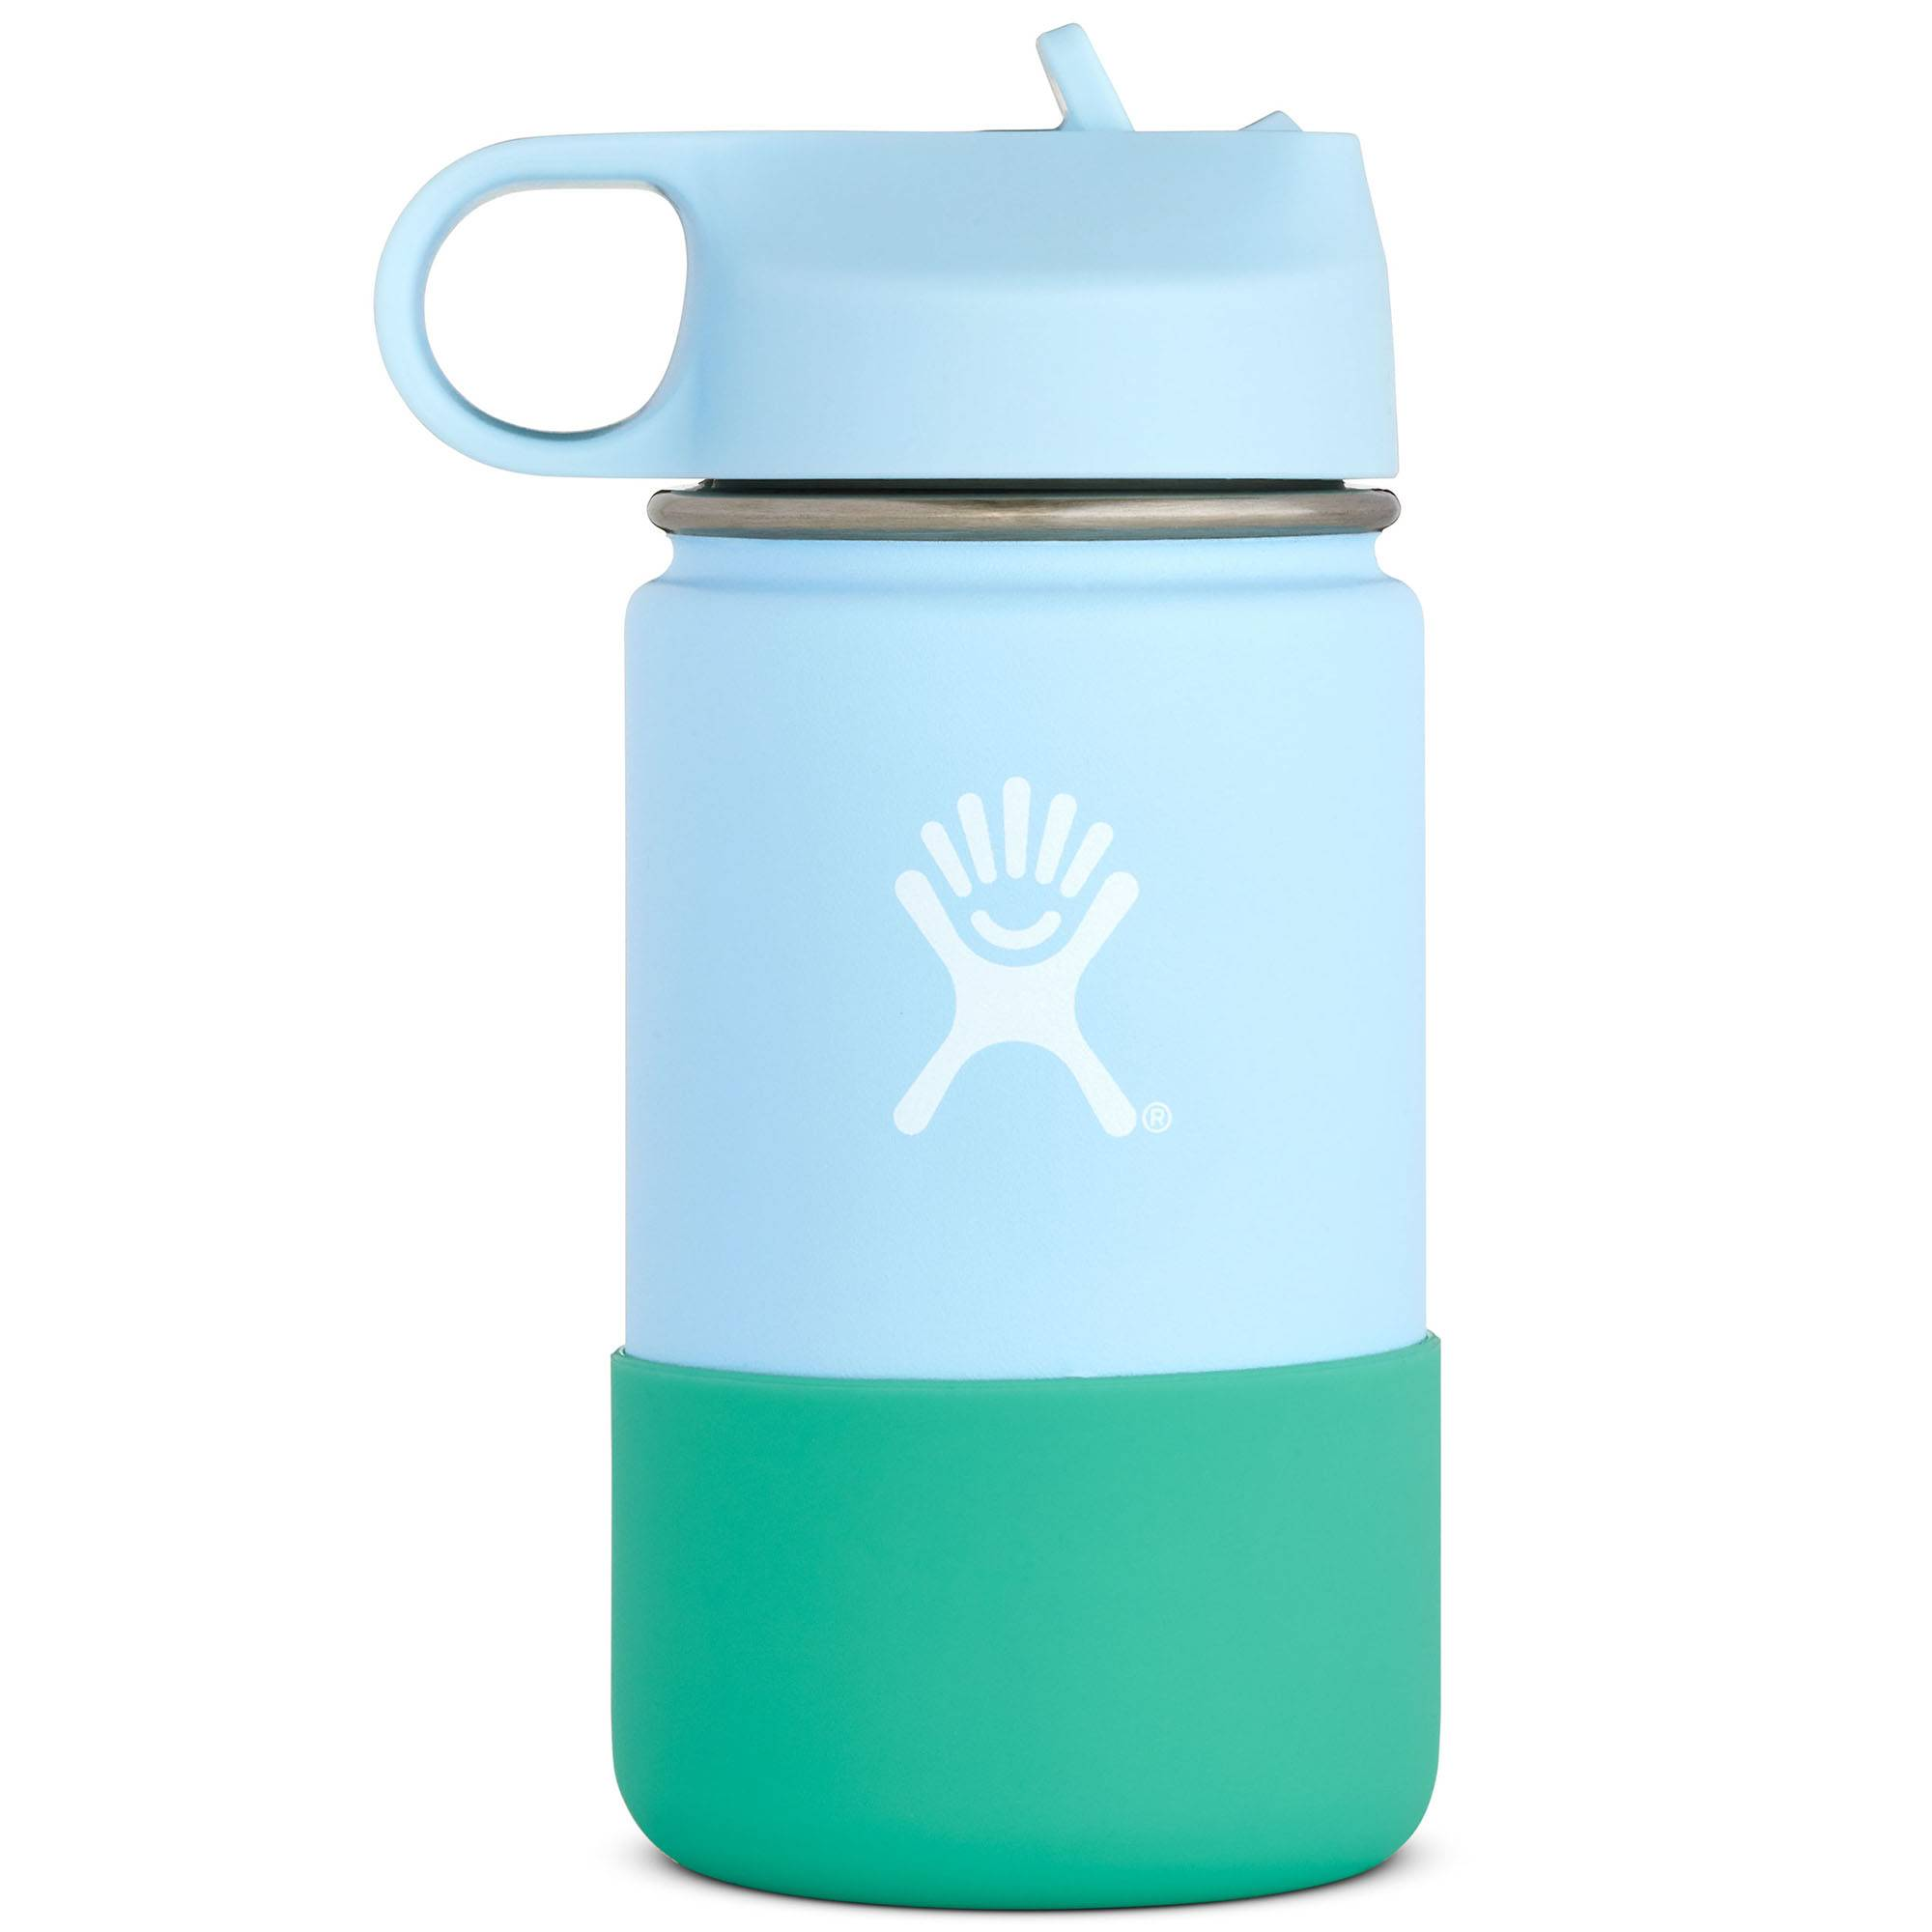 Hydro Flask Kids' 12 Oz Wide Mouth Bottle  - Frost - Size: 12 oz.